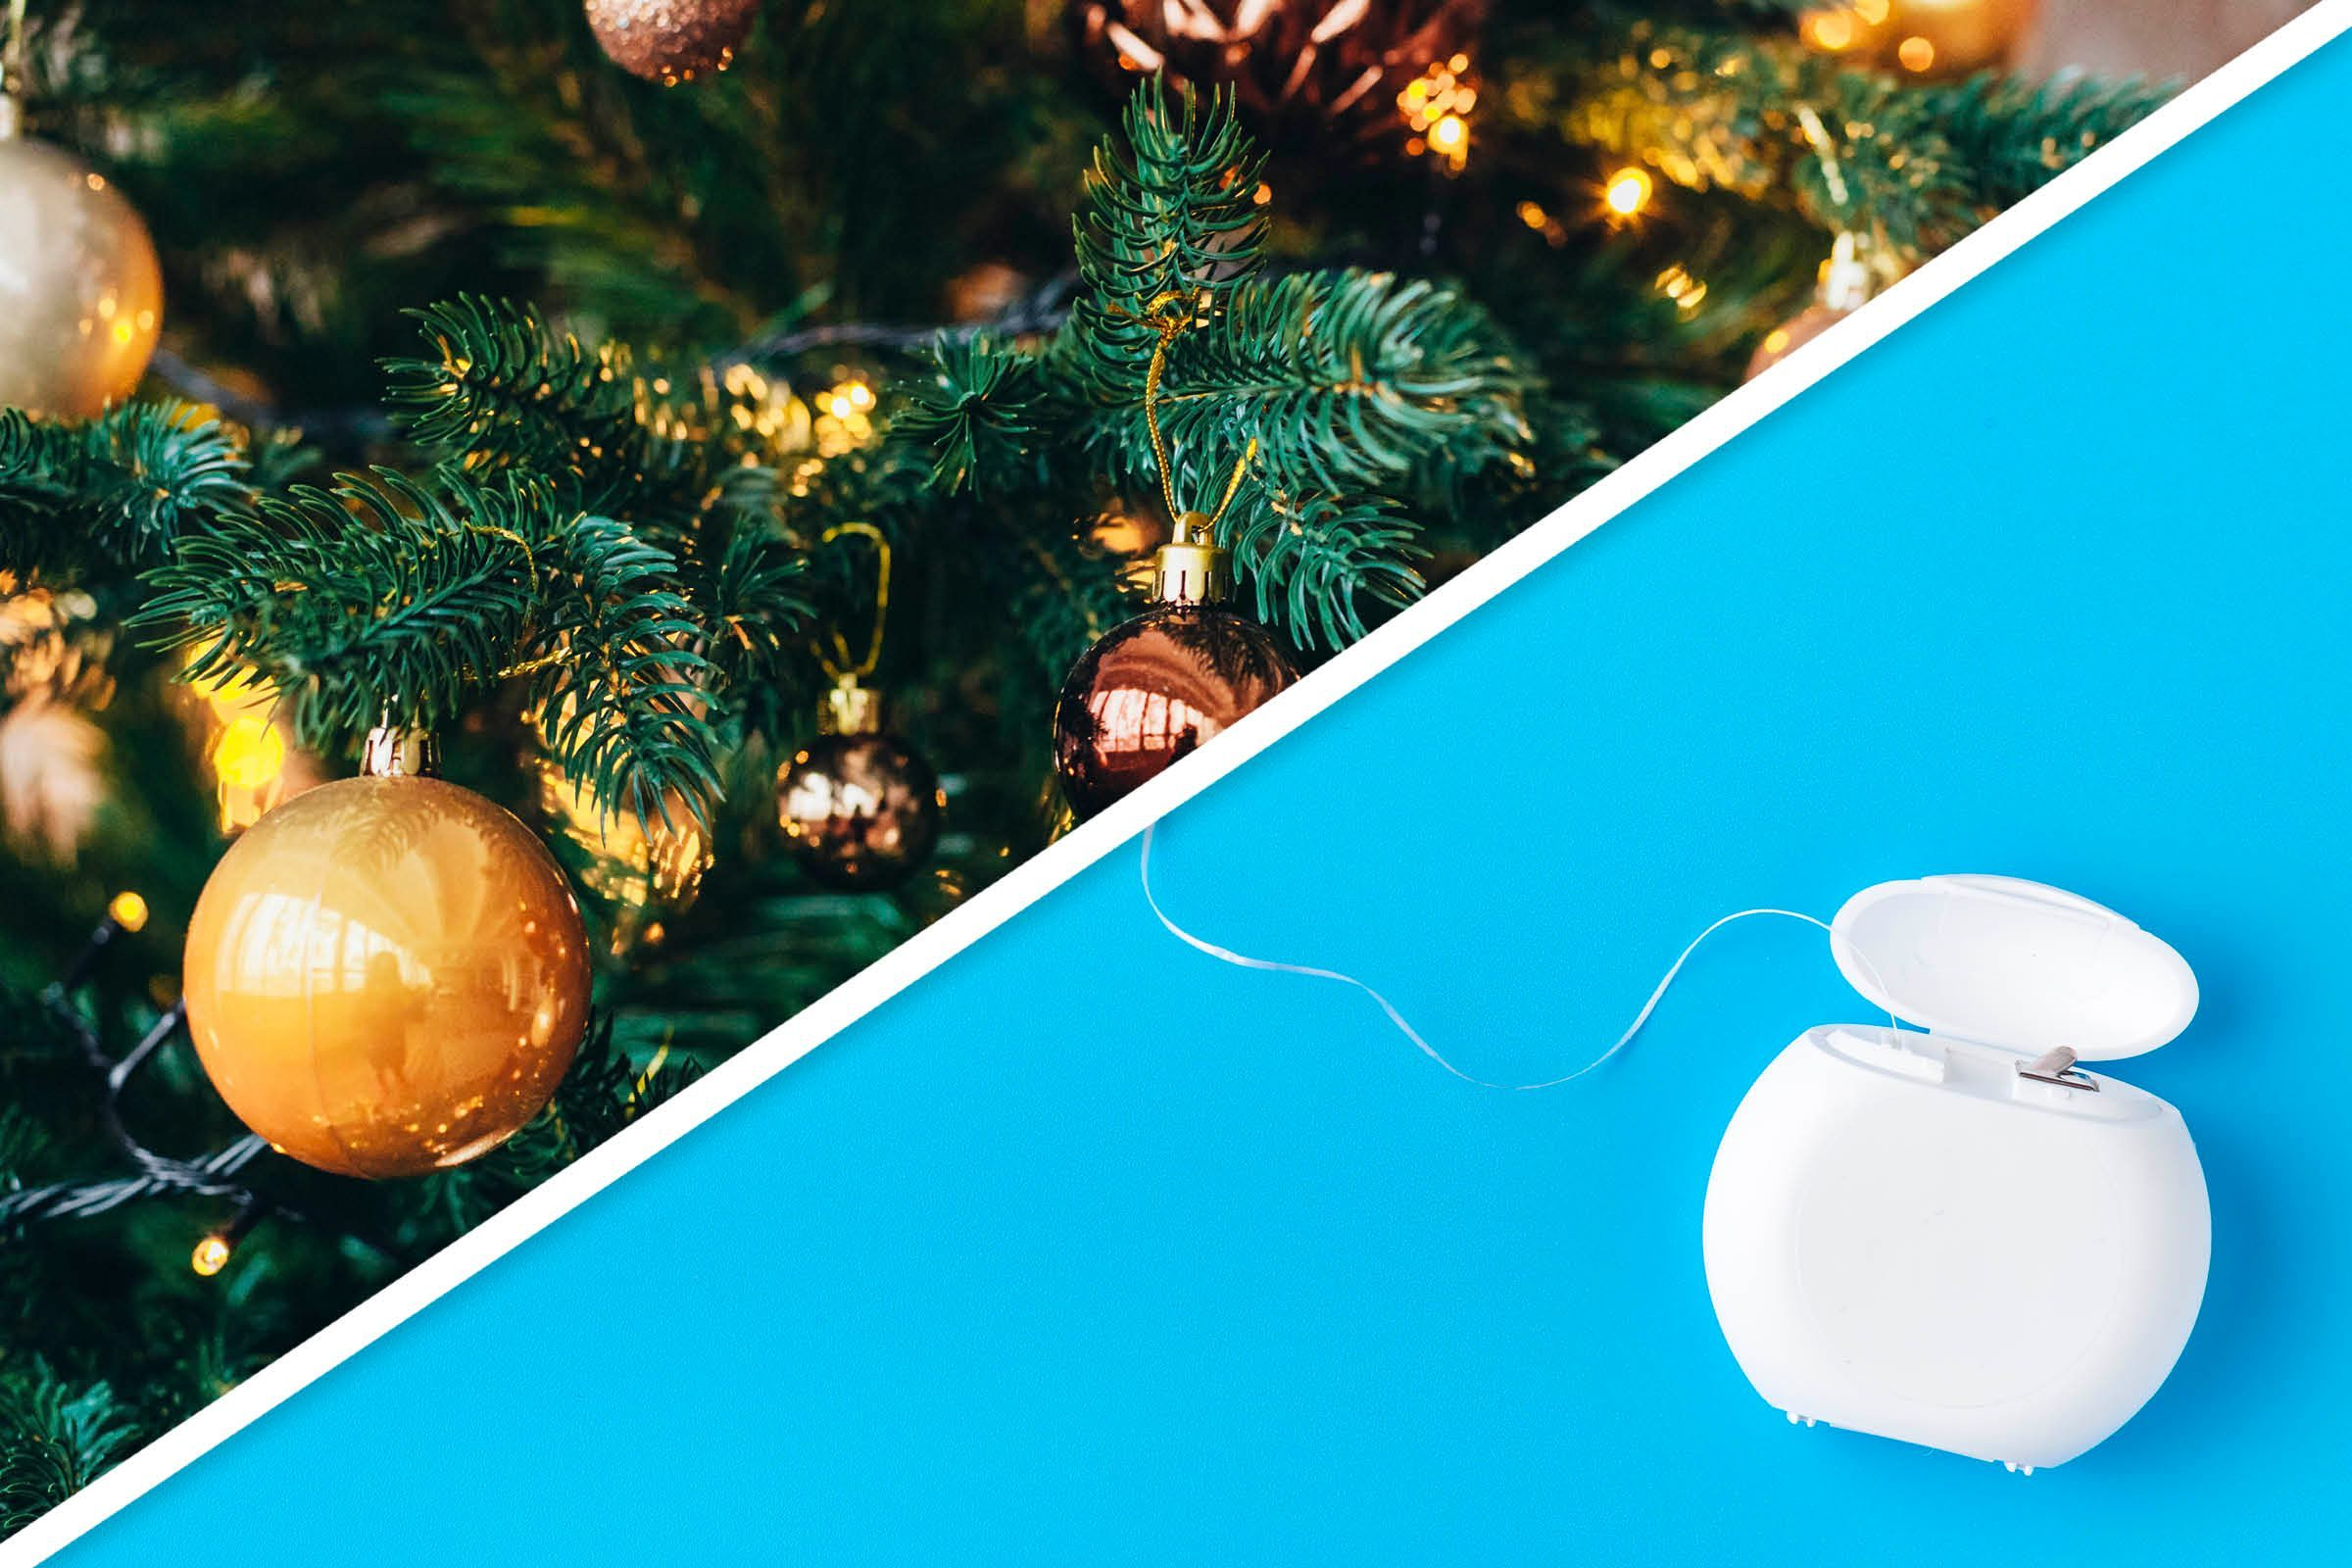 Christmas ornaments and floss